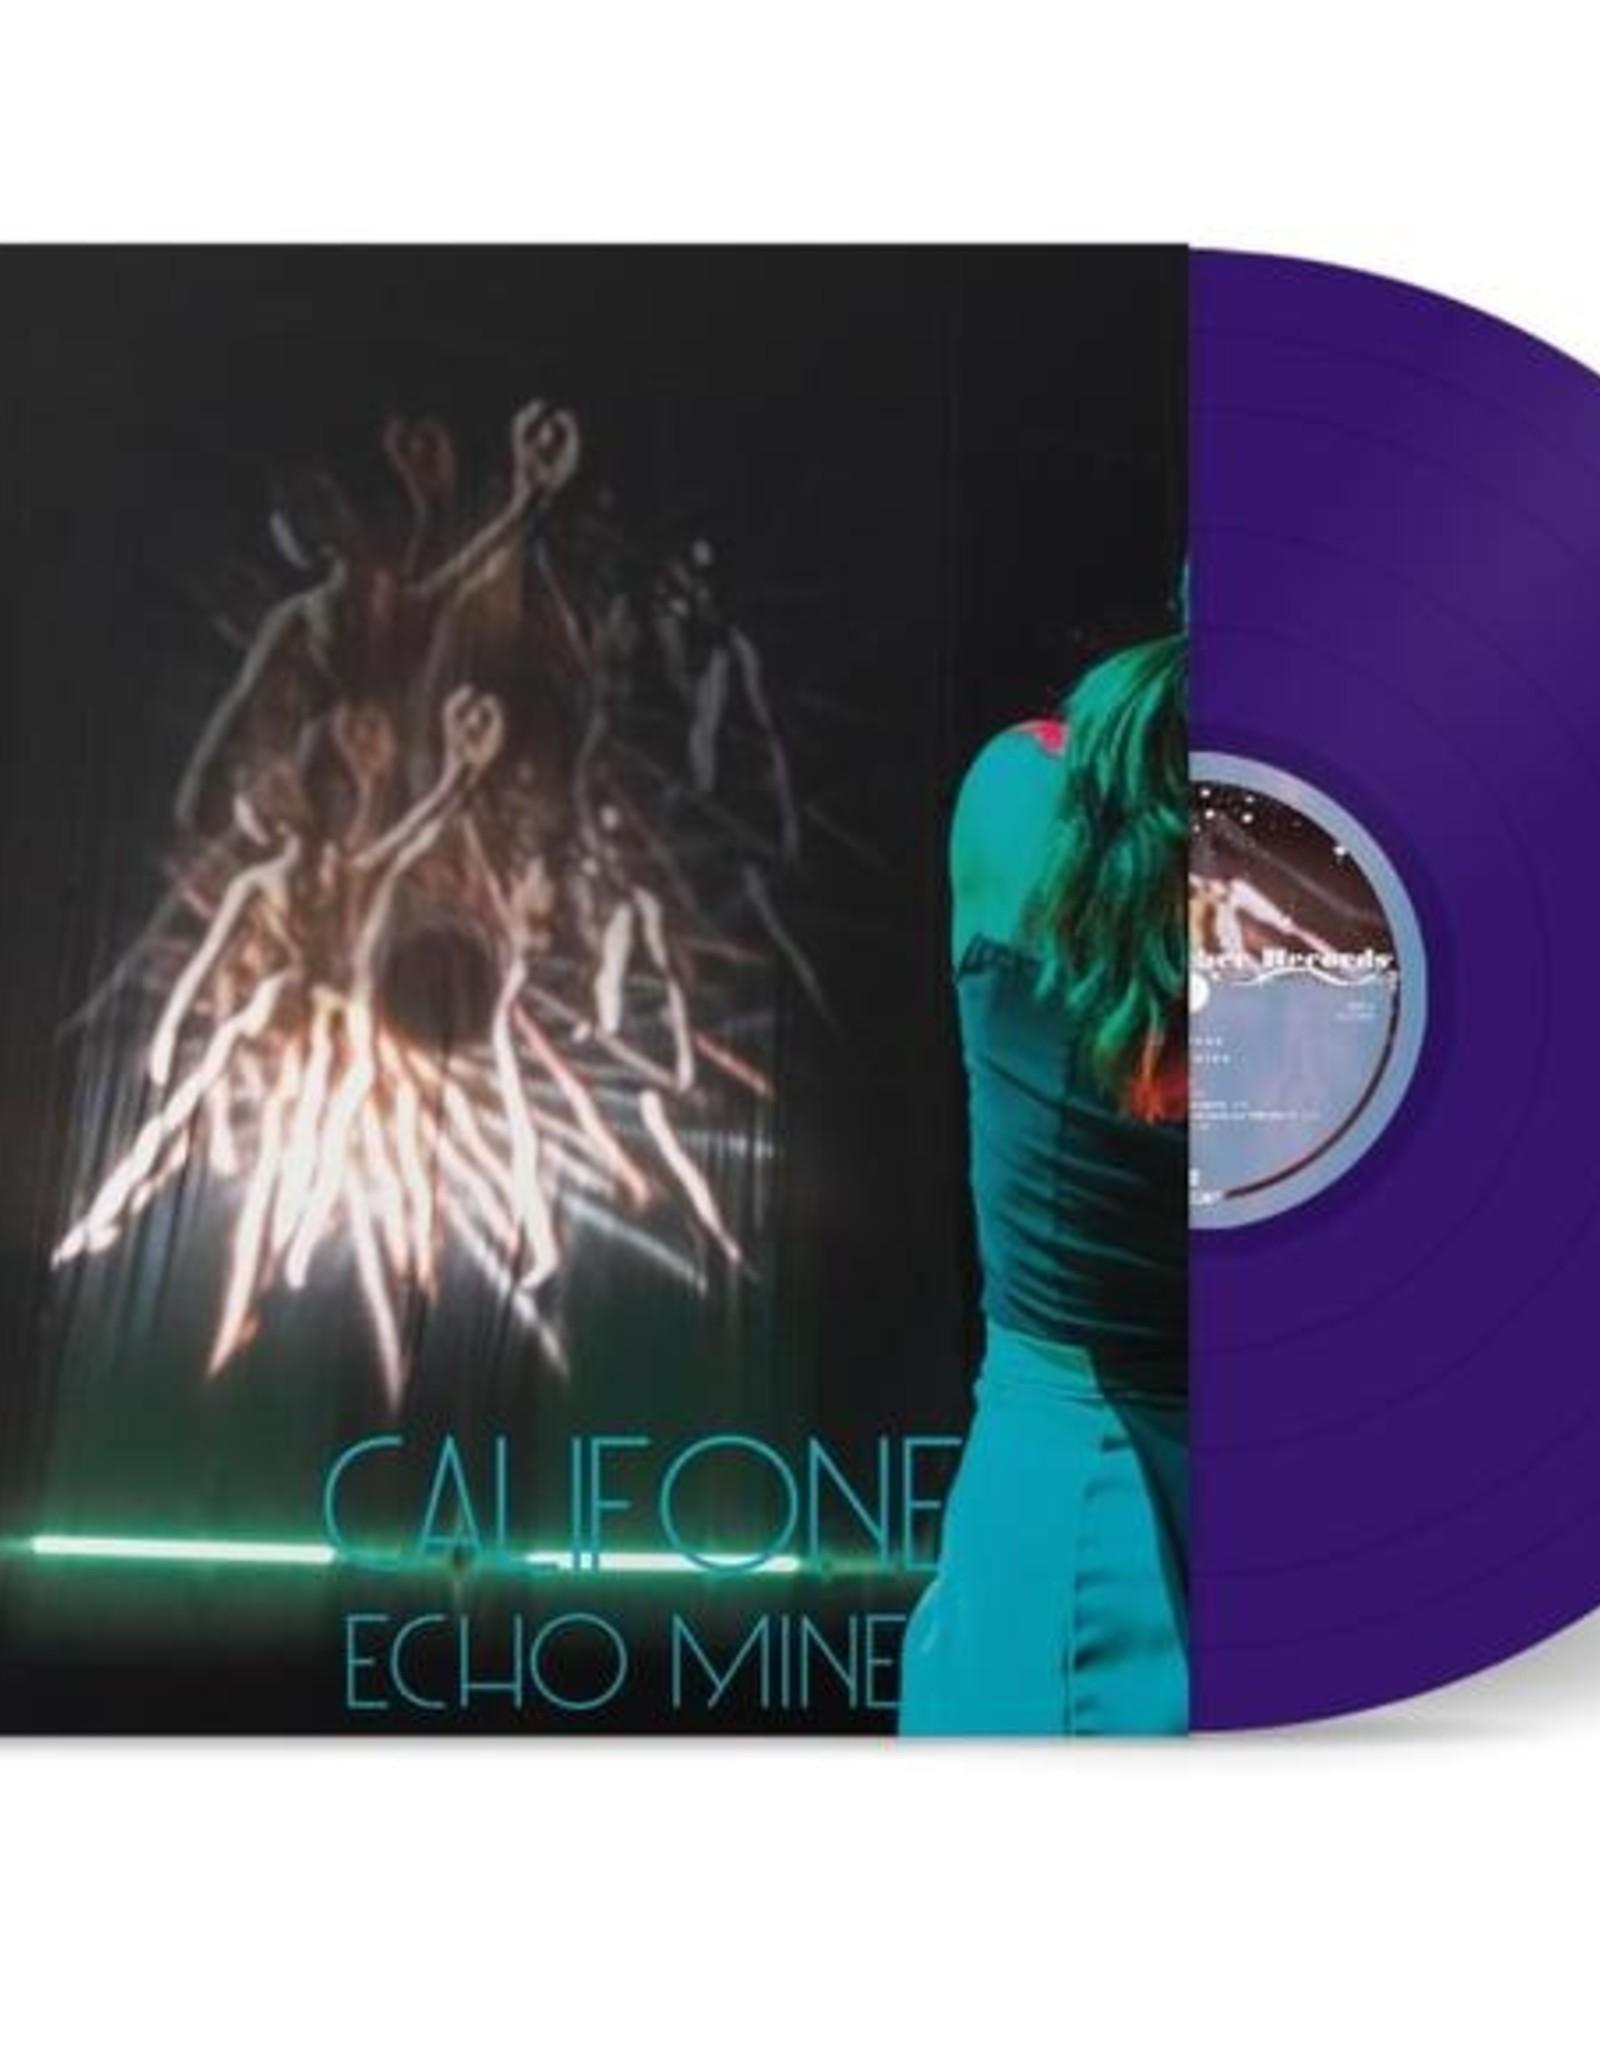 Califone - Echo Mine (Indie Exclusive Purple Vinyl)